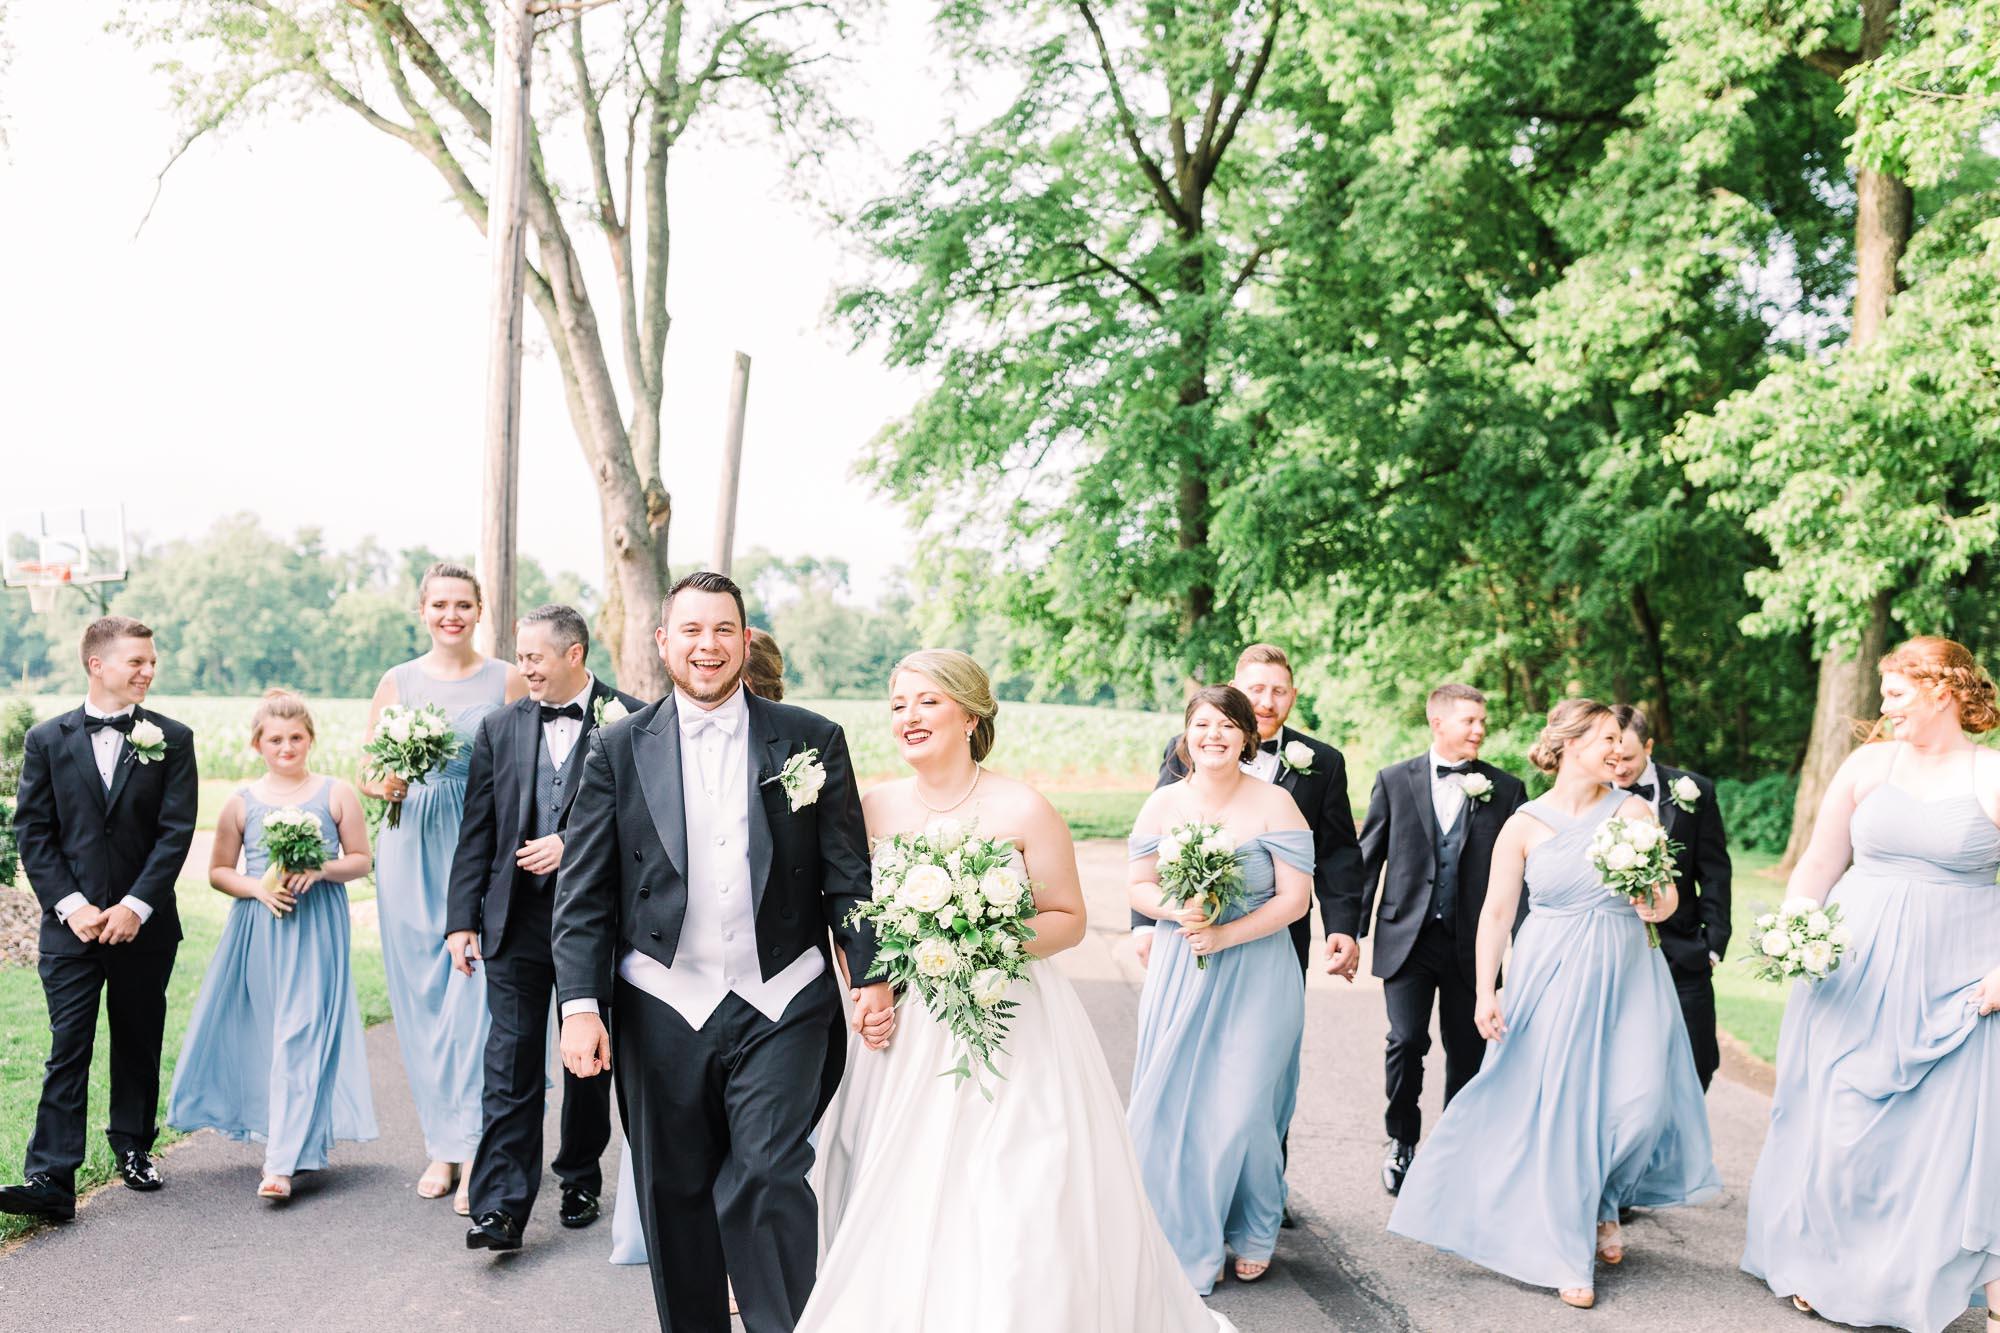 isle-of-que-wedding-6848.jpg